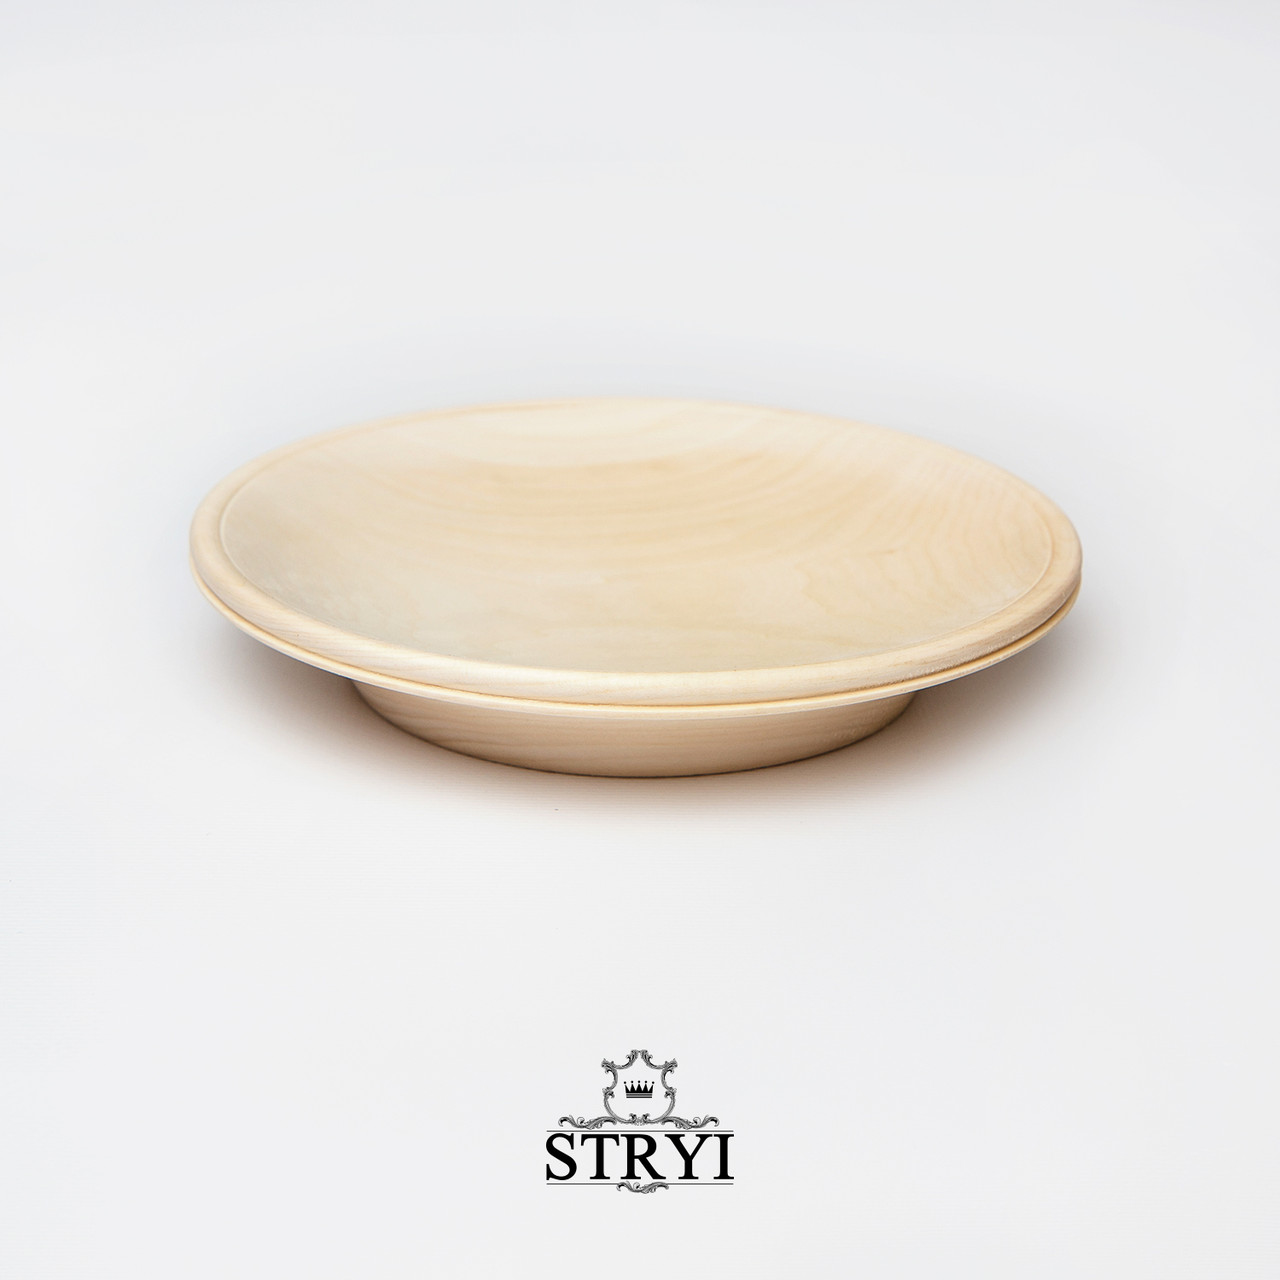 Тарелка, липовая заготовка для резьбы, 200 мм